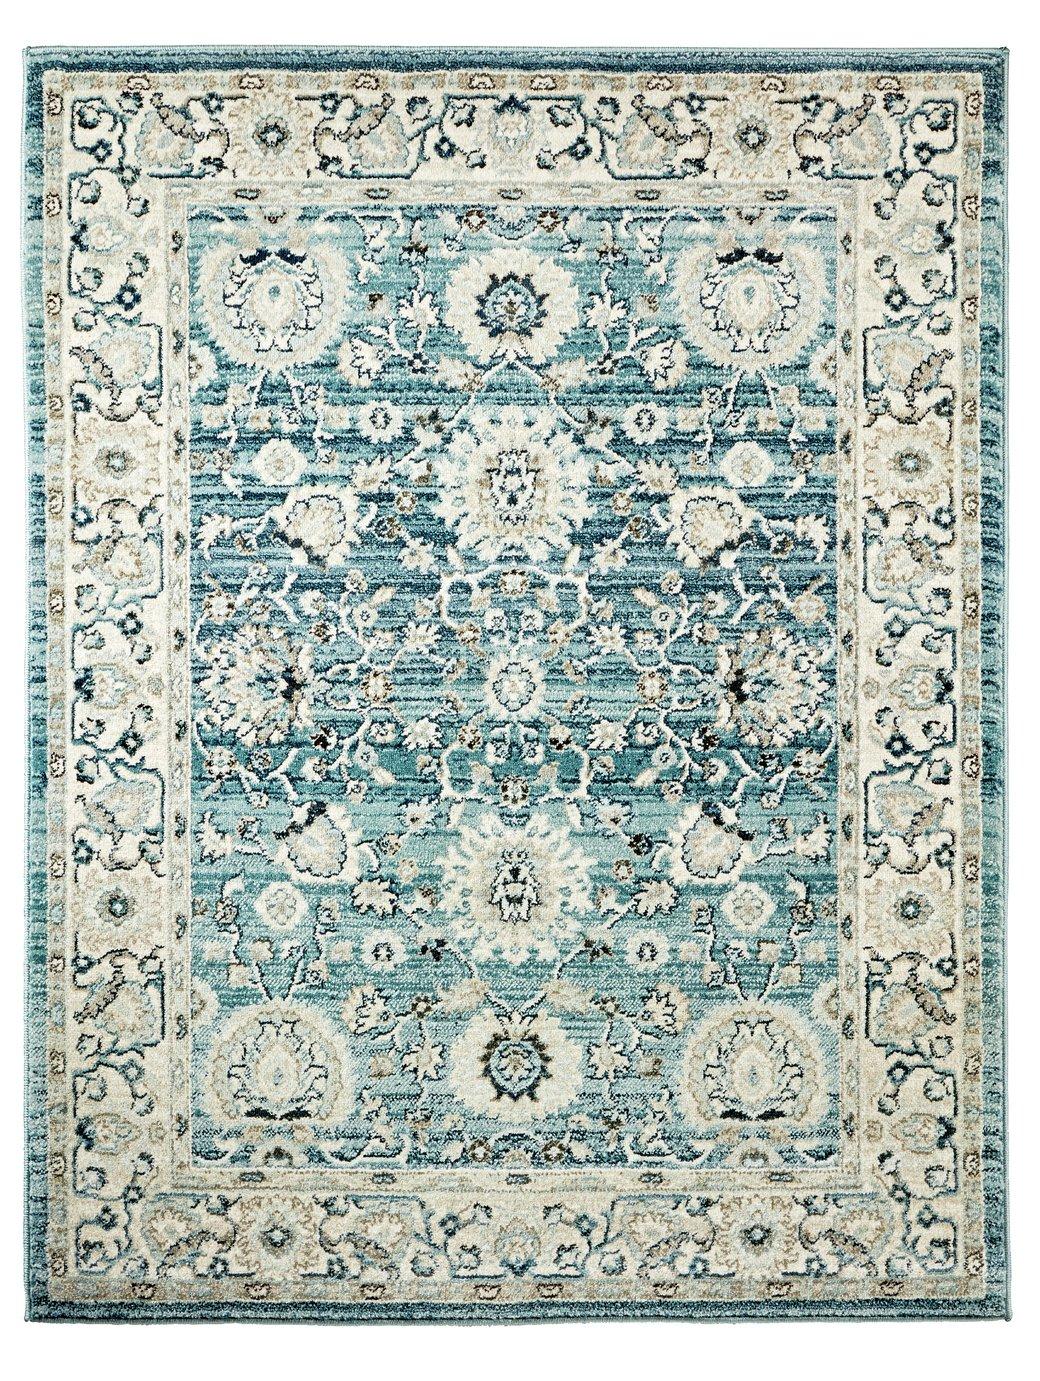 Argos Home Floral Persian Rug - 120x160cm - Blue